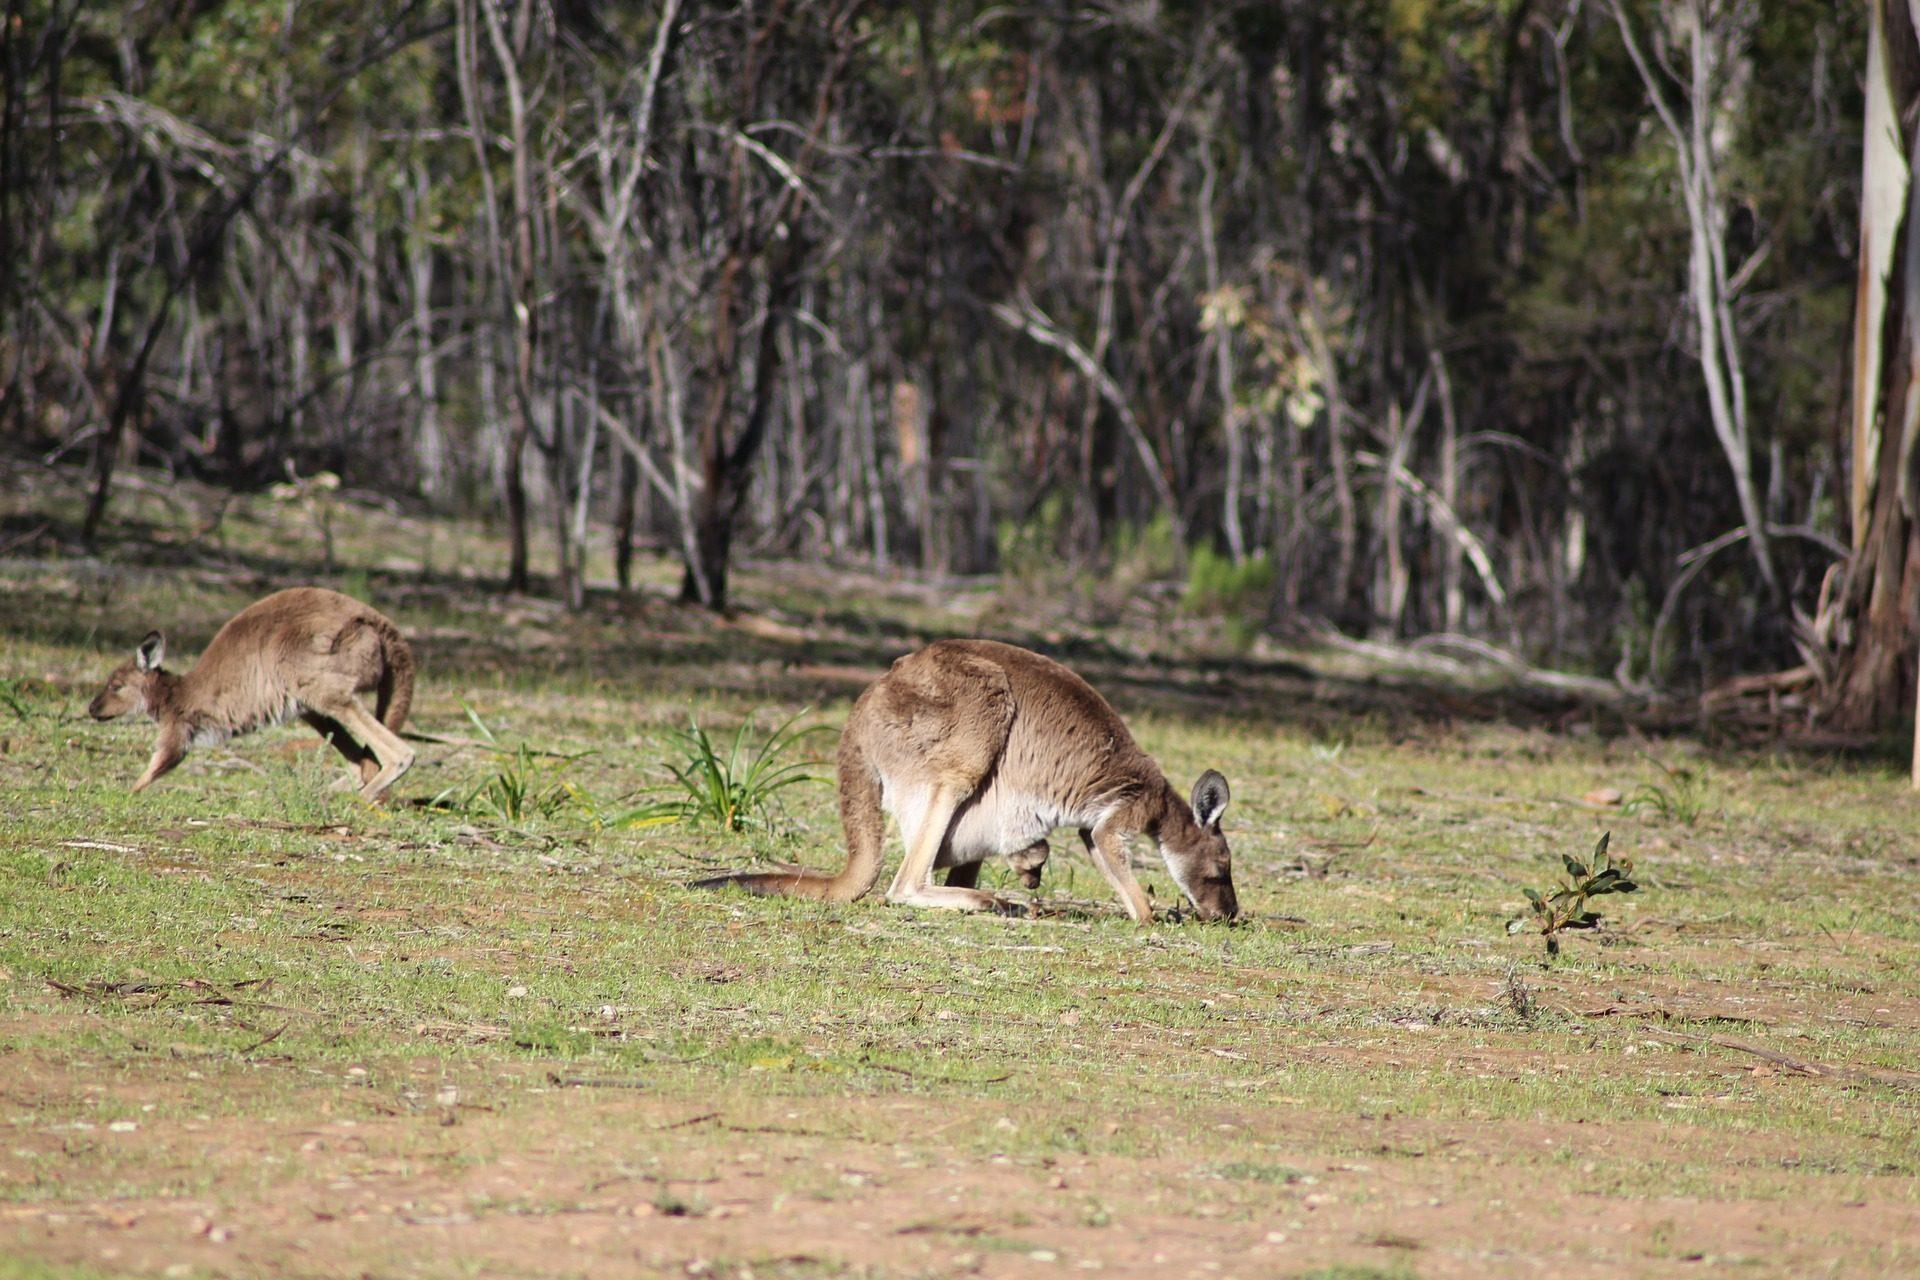 Kangourou, marsupial, Forest, domaine, Australie - Fonds d'écran HD - Professor-falken.com